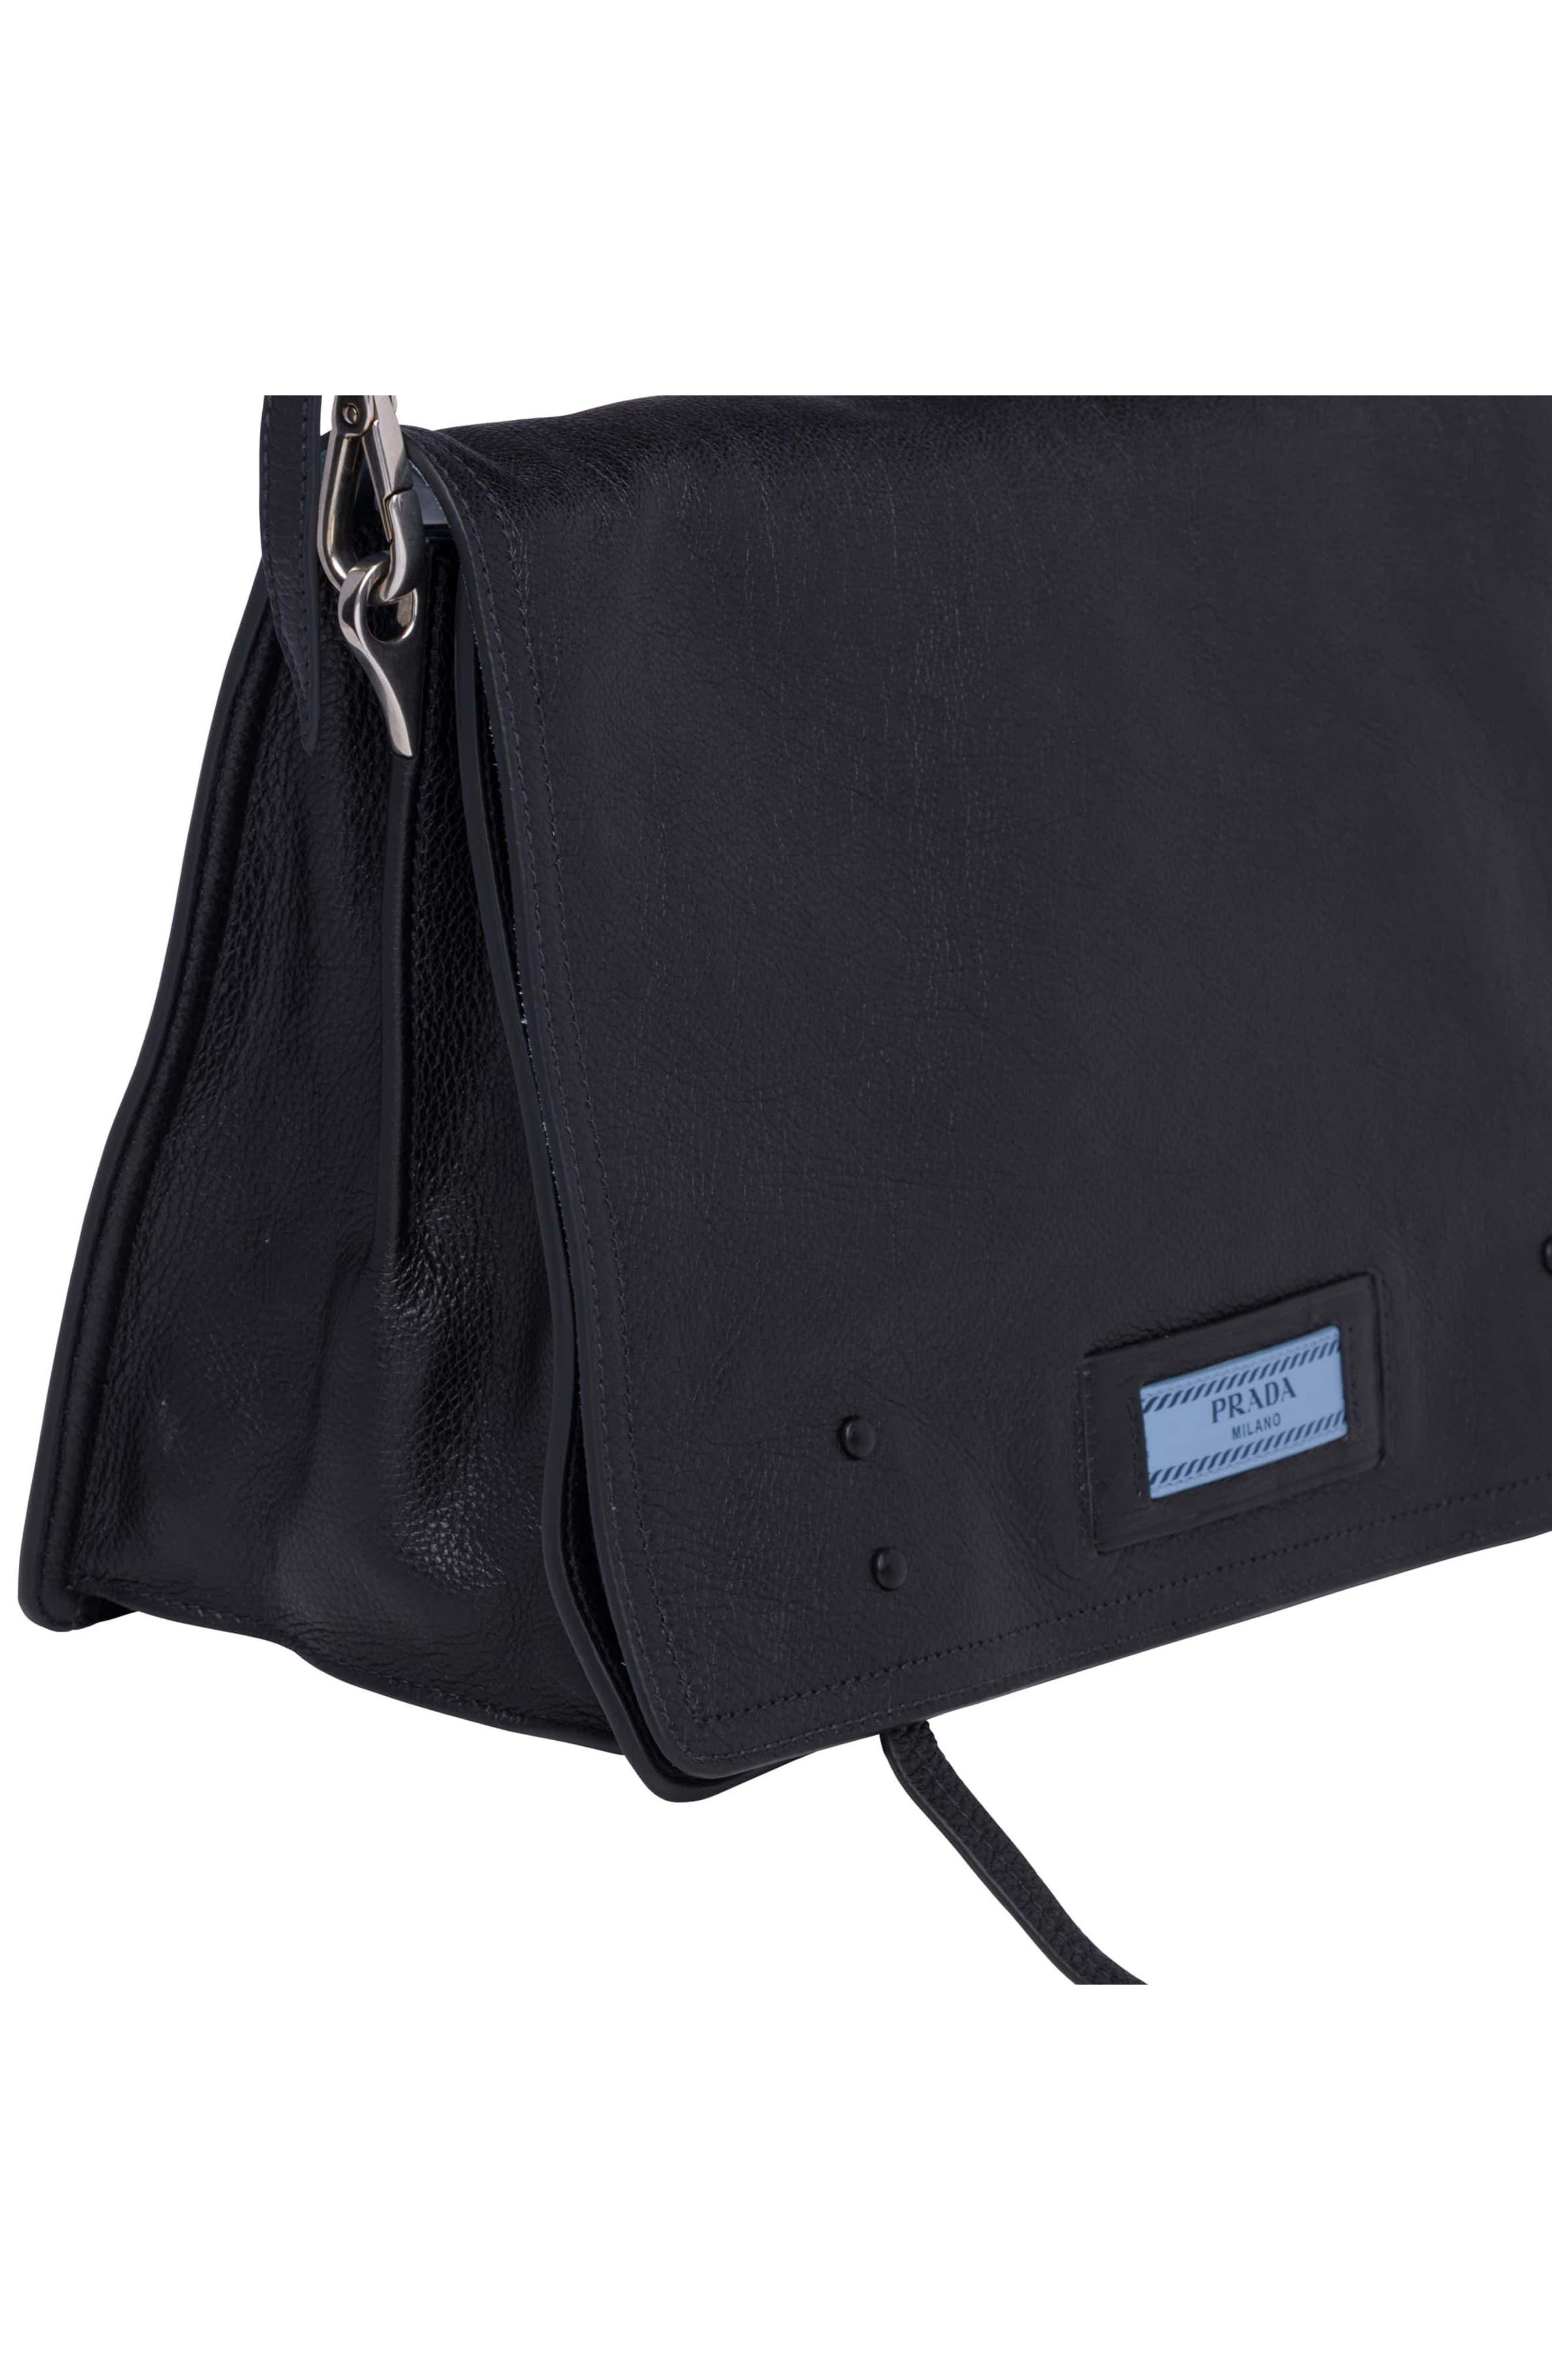 Cahier Glace Messenger Bag,                             Alternate thumbnail 5, color,